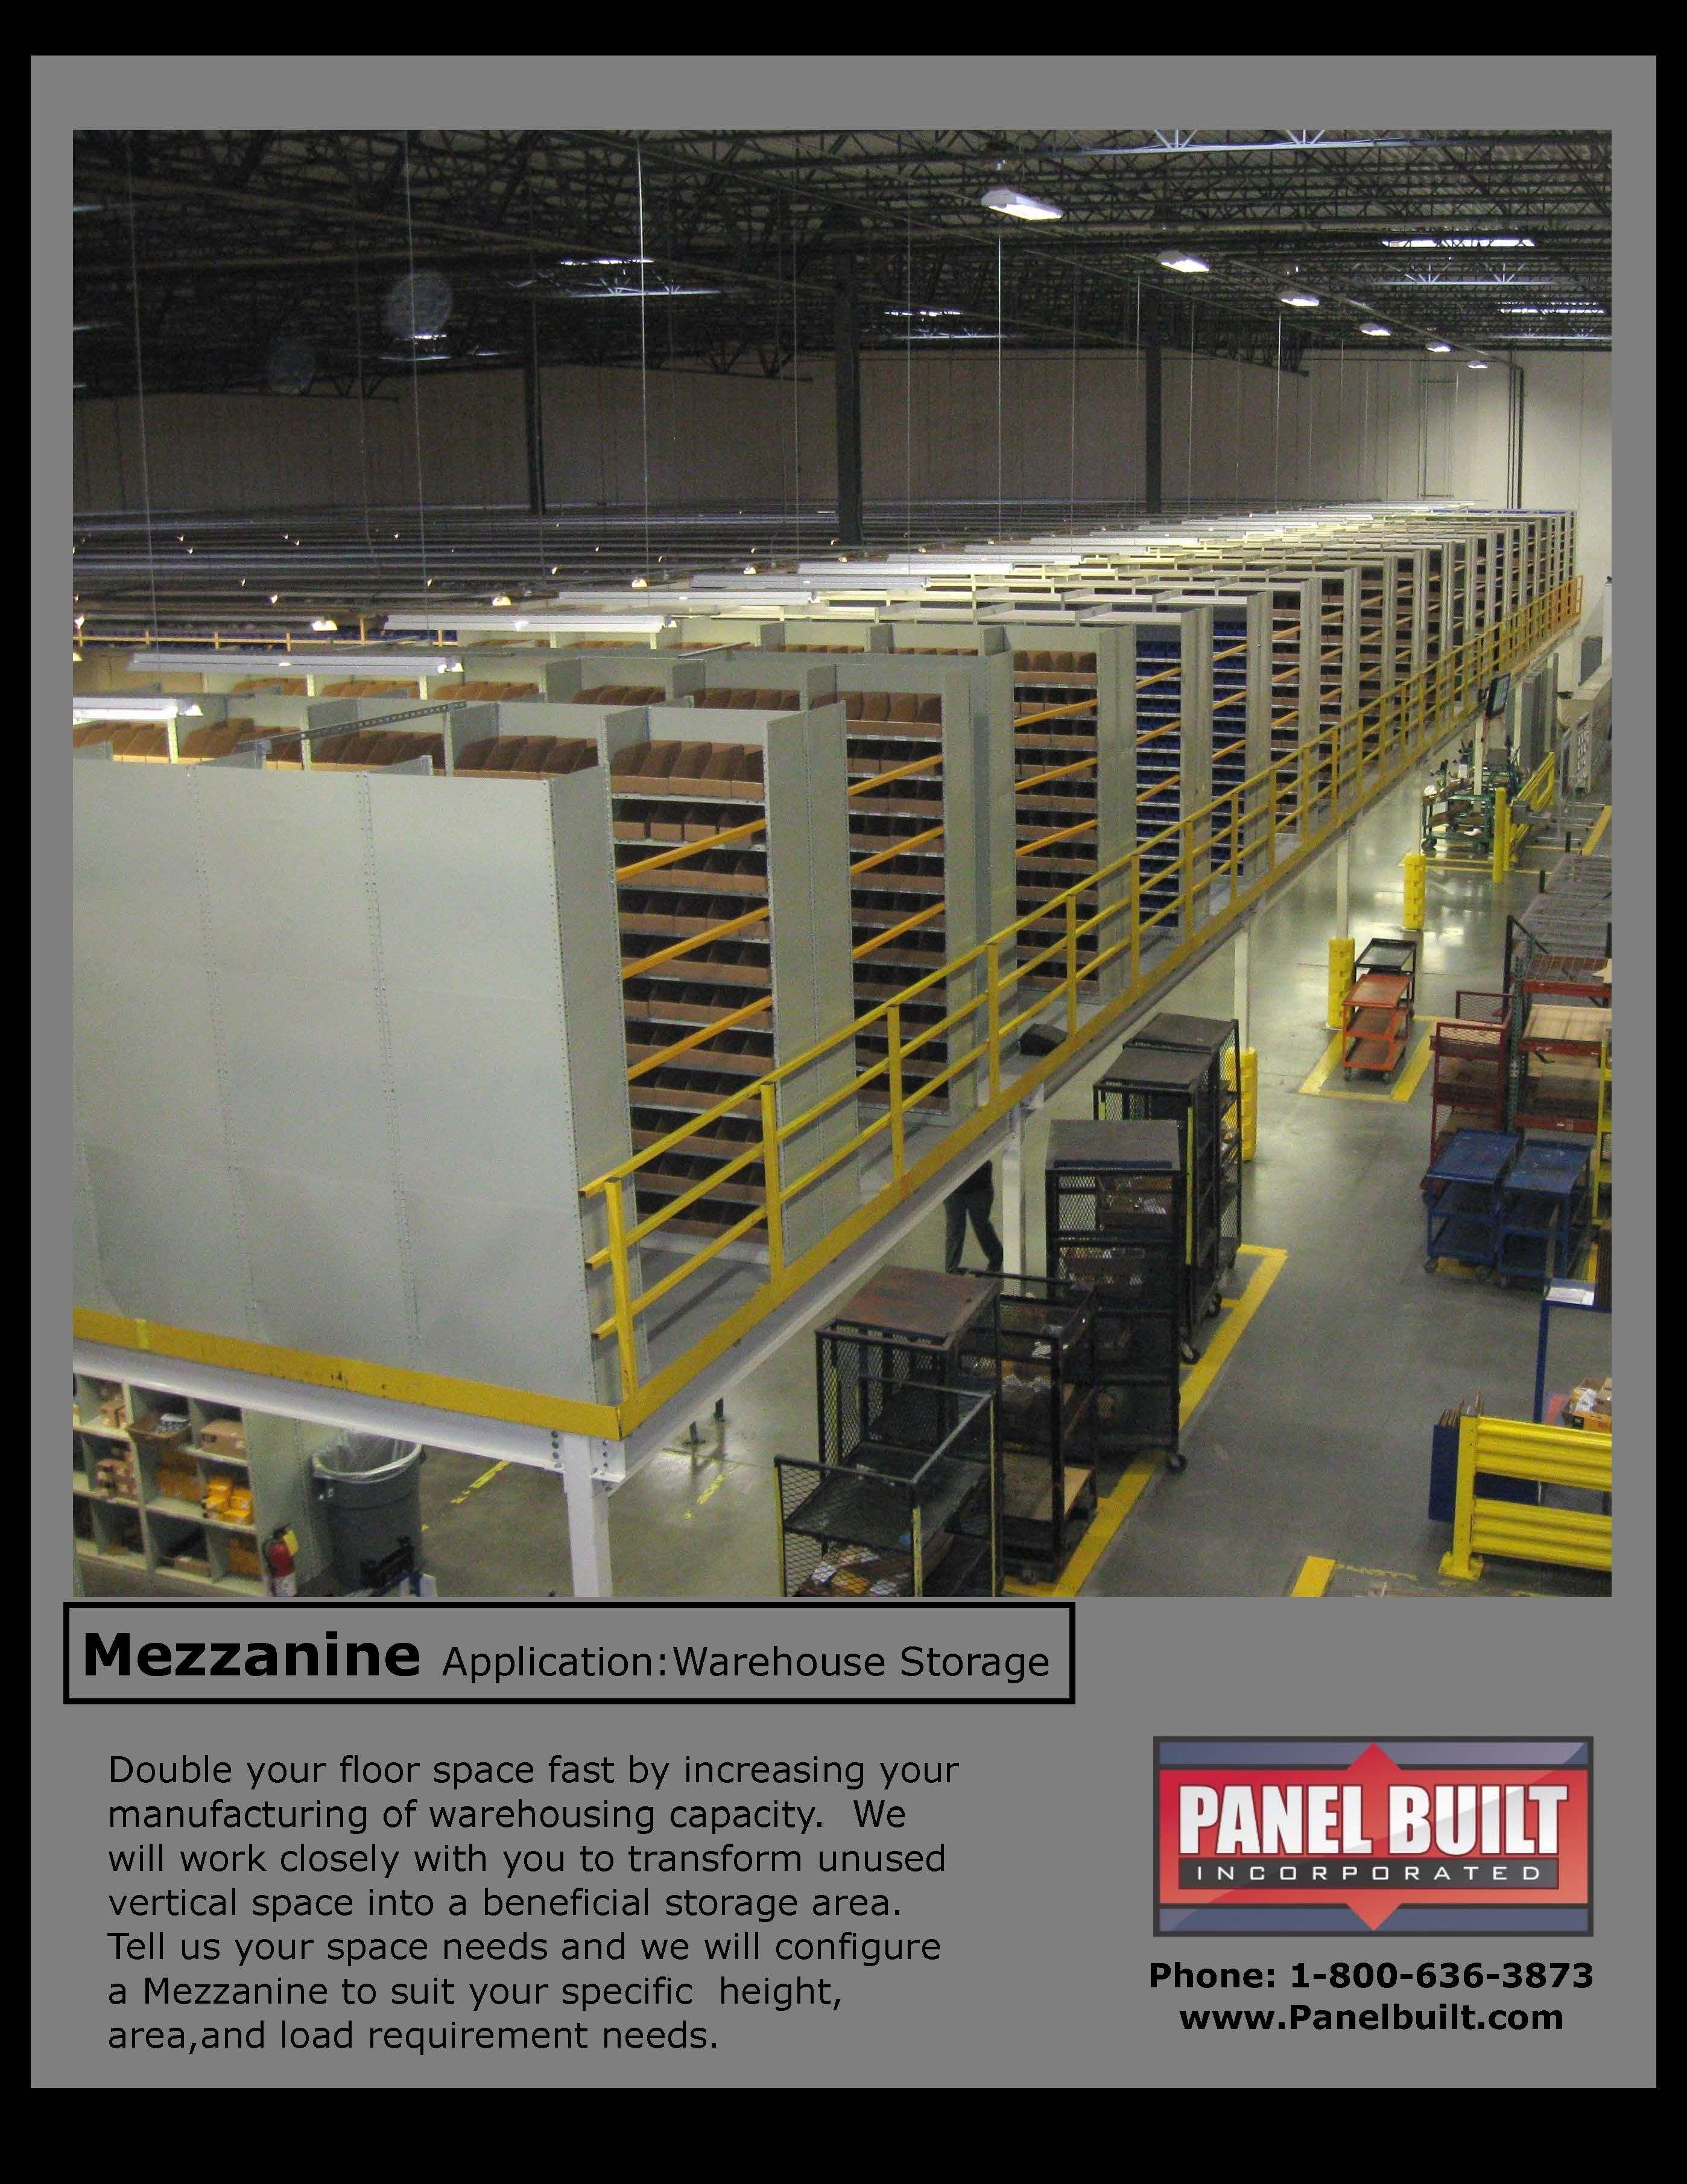 warehouse mezzanine modular office. Mezzanines For Warehouse Storage Mezzanine Modular Office